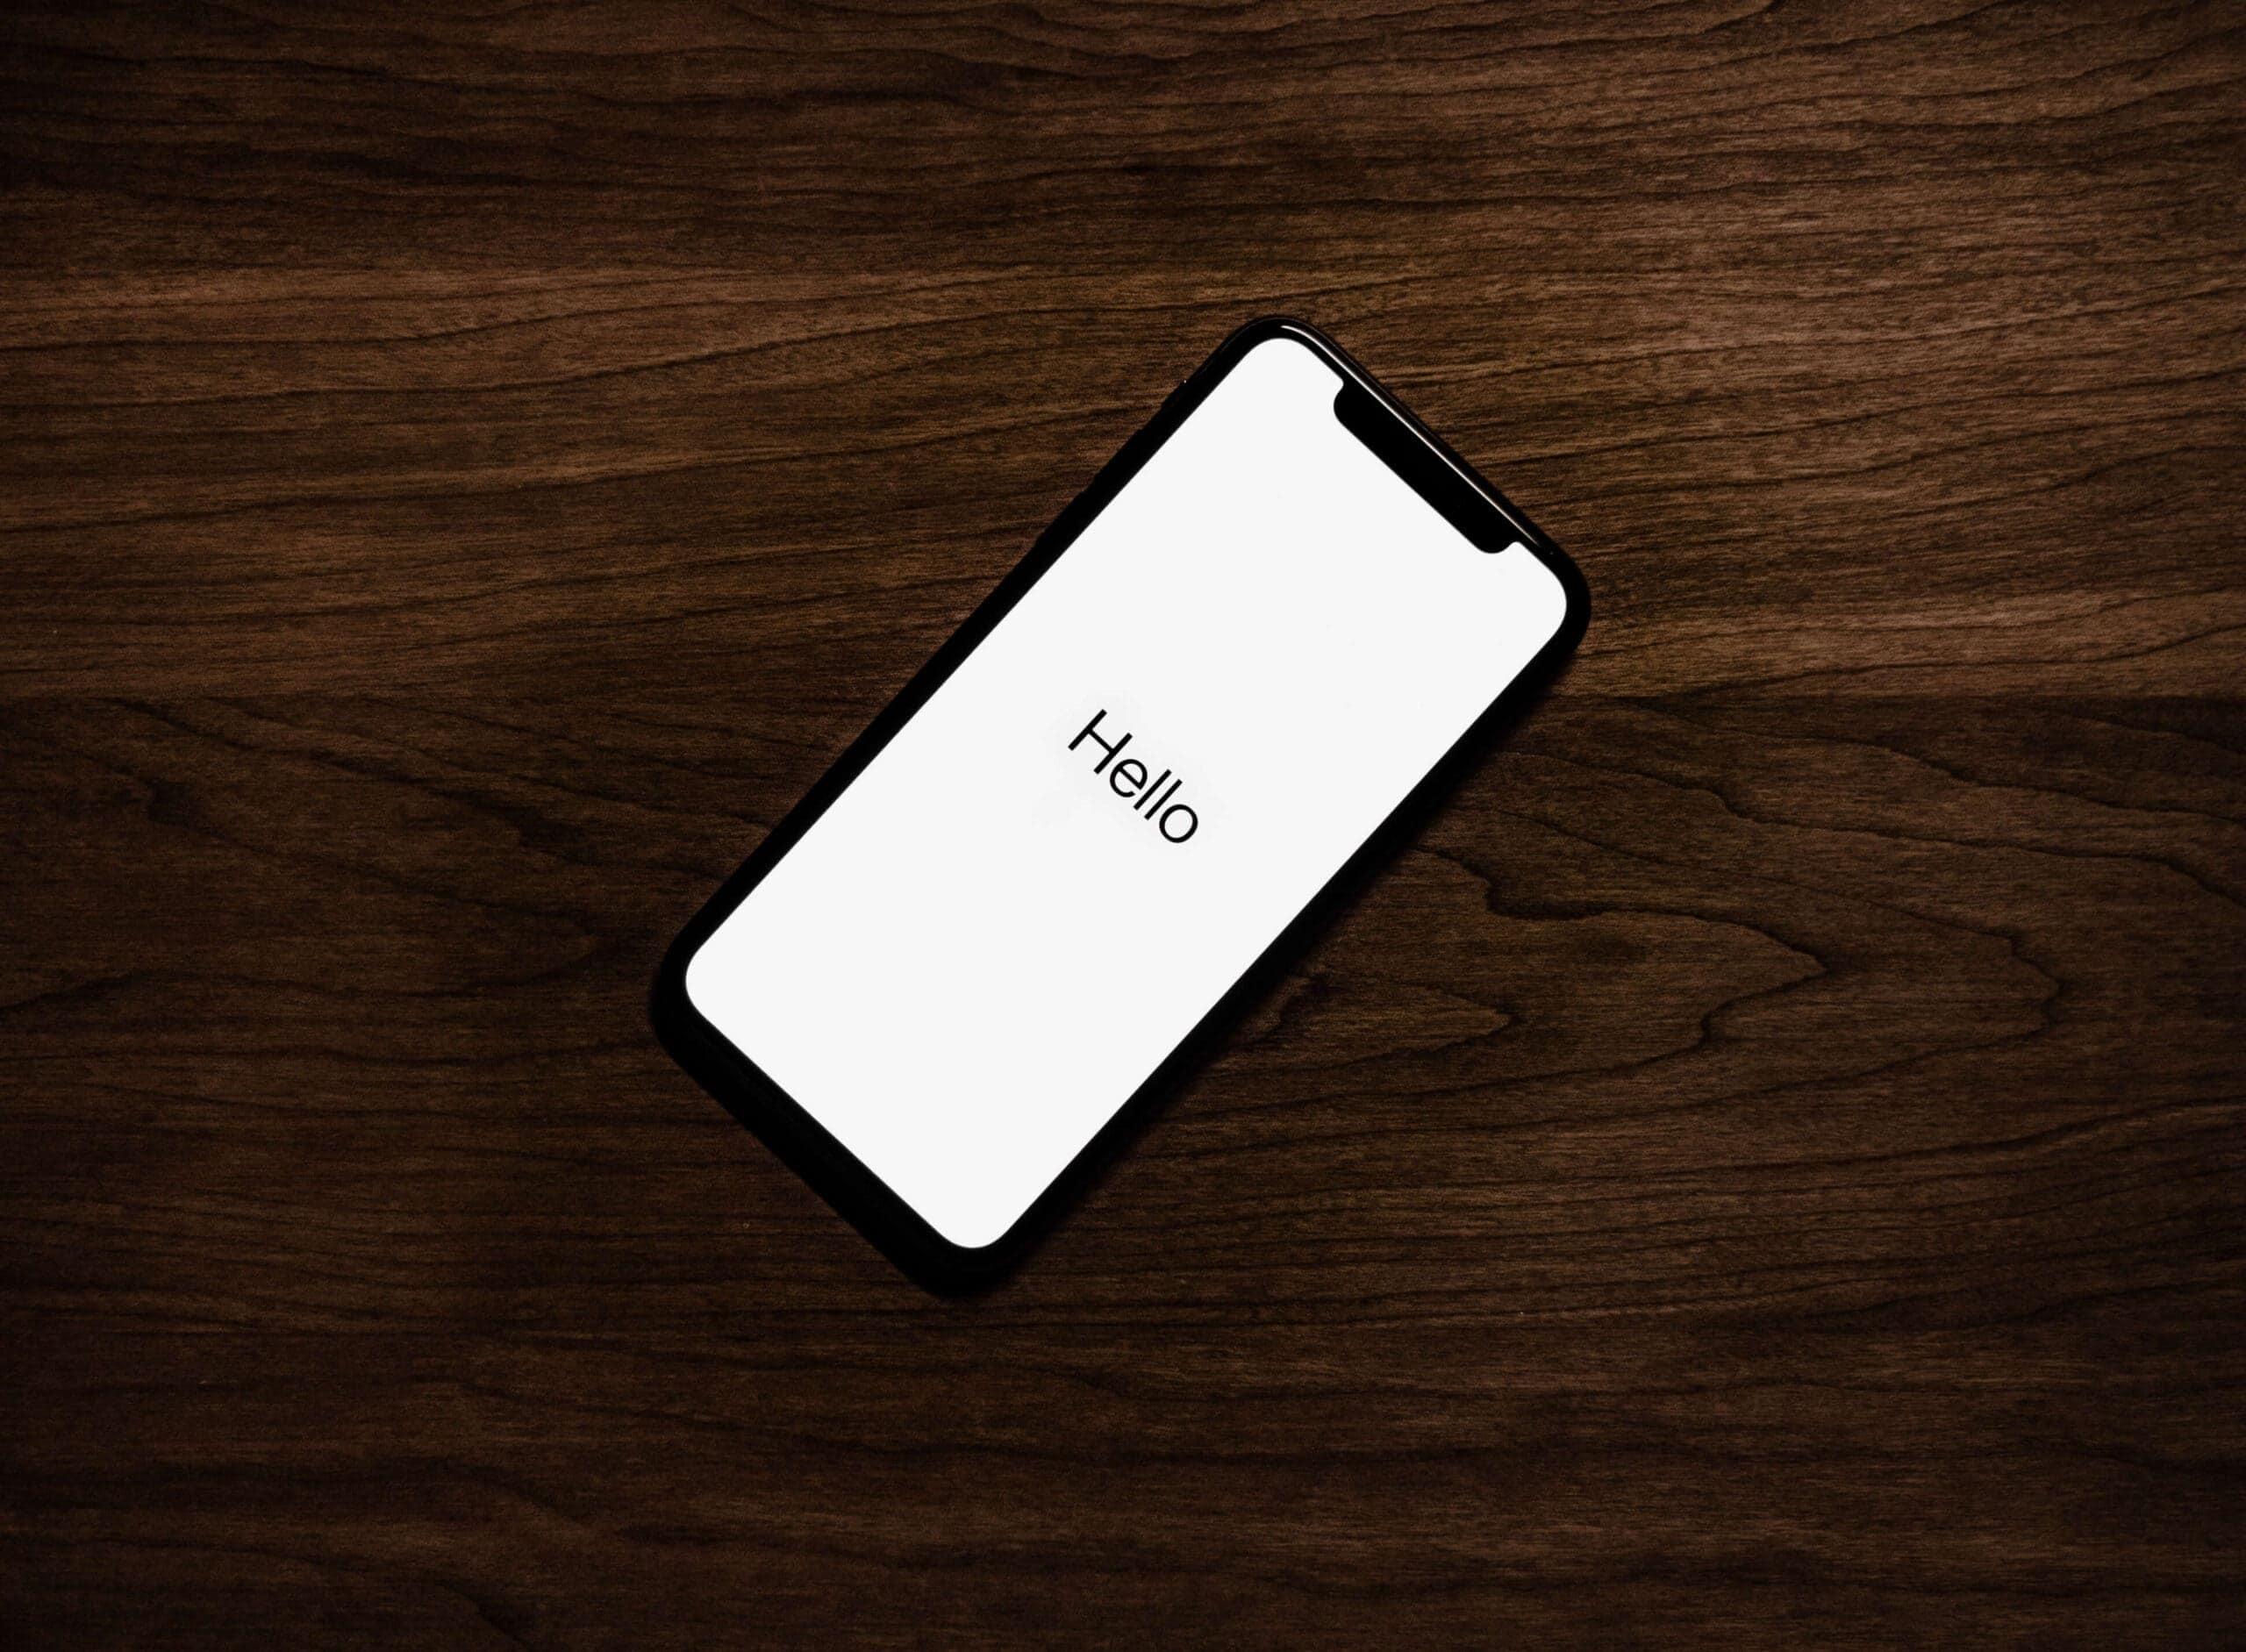 iphone zawiesza się na logo apple